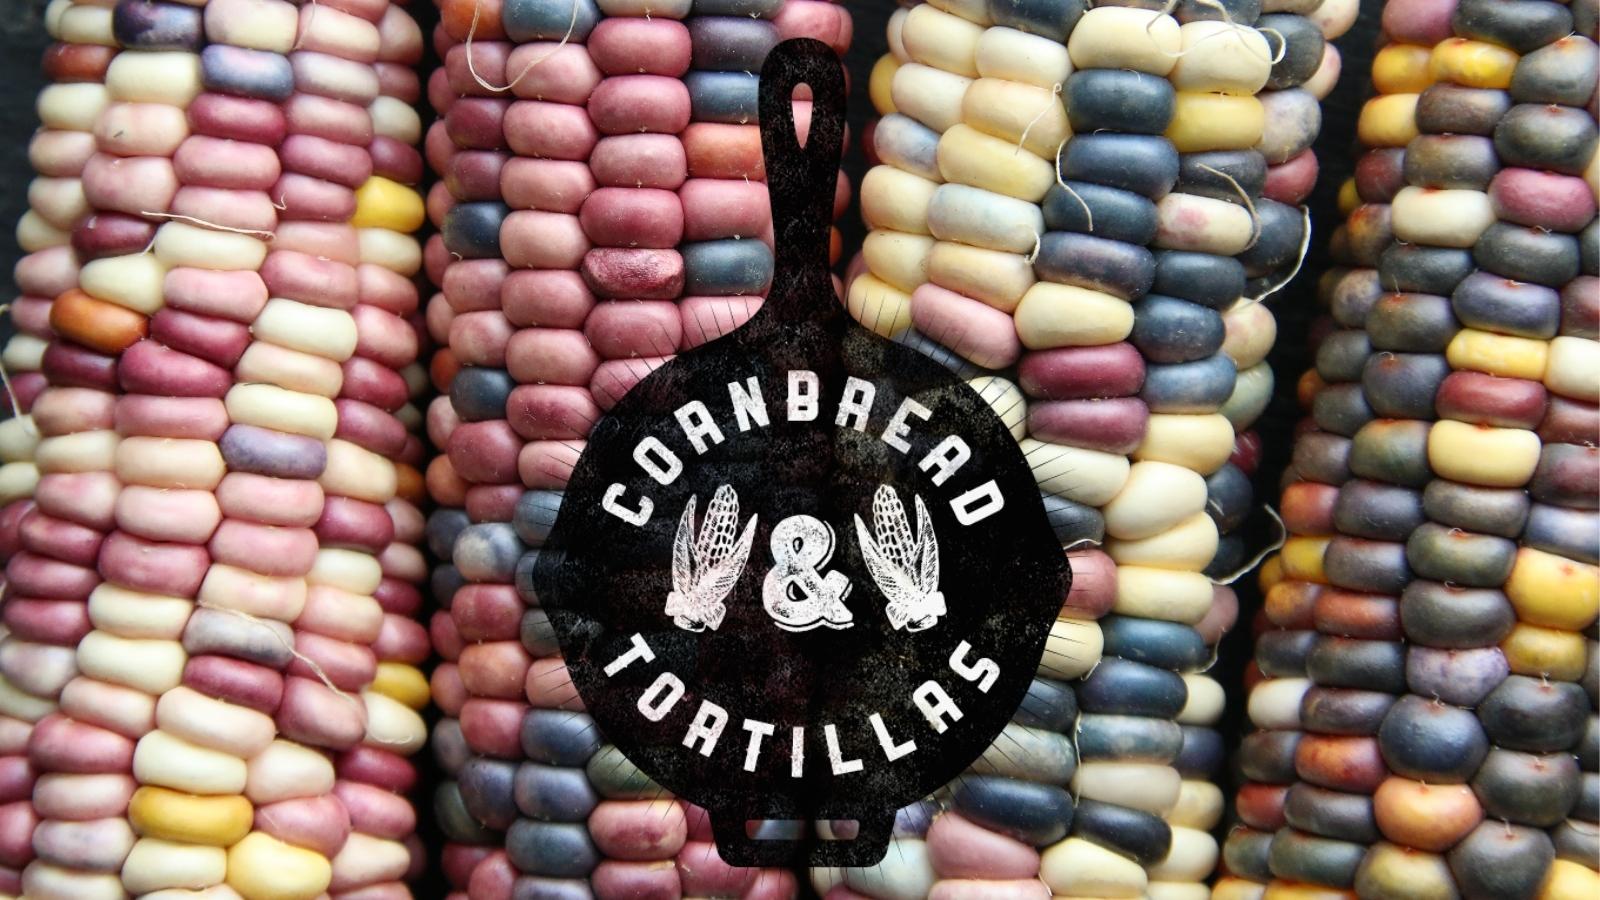 Cornbread and Tortillas Residency